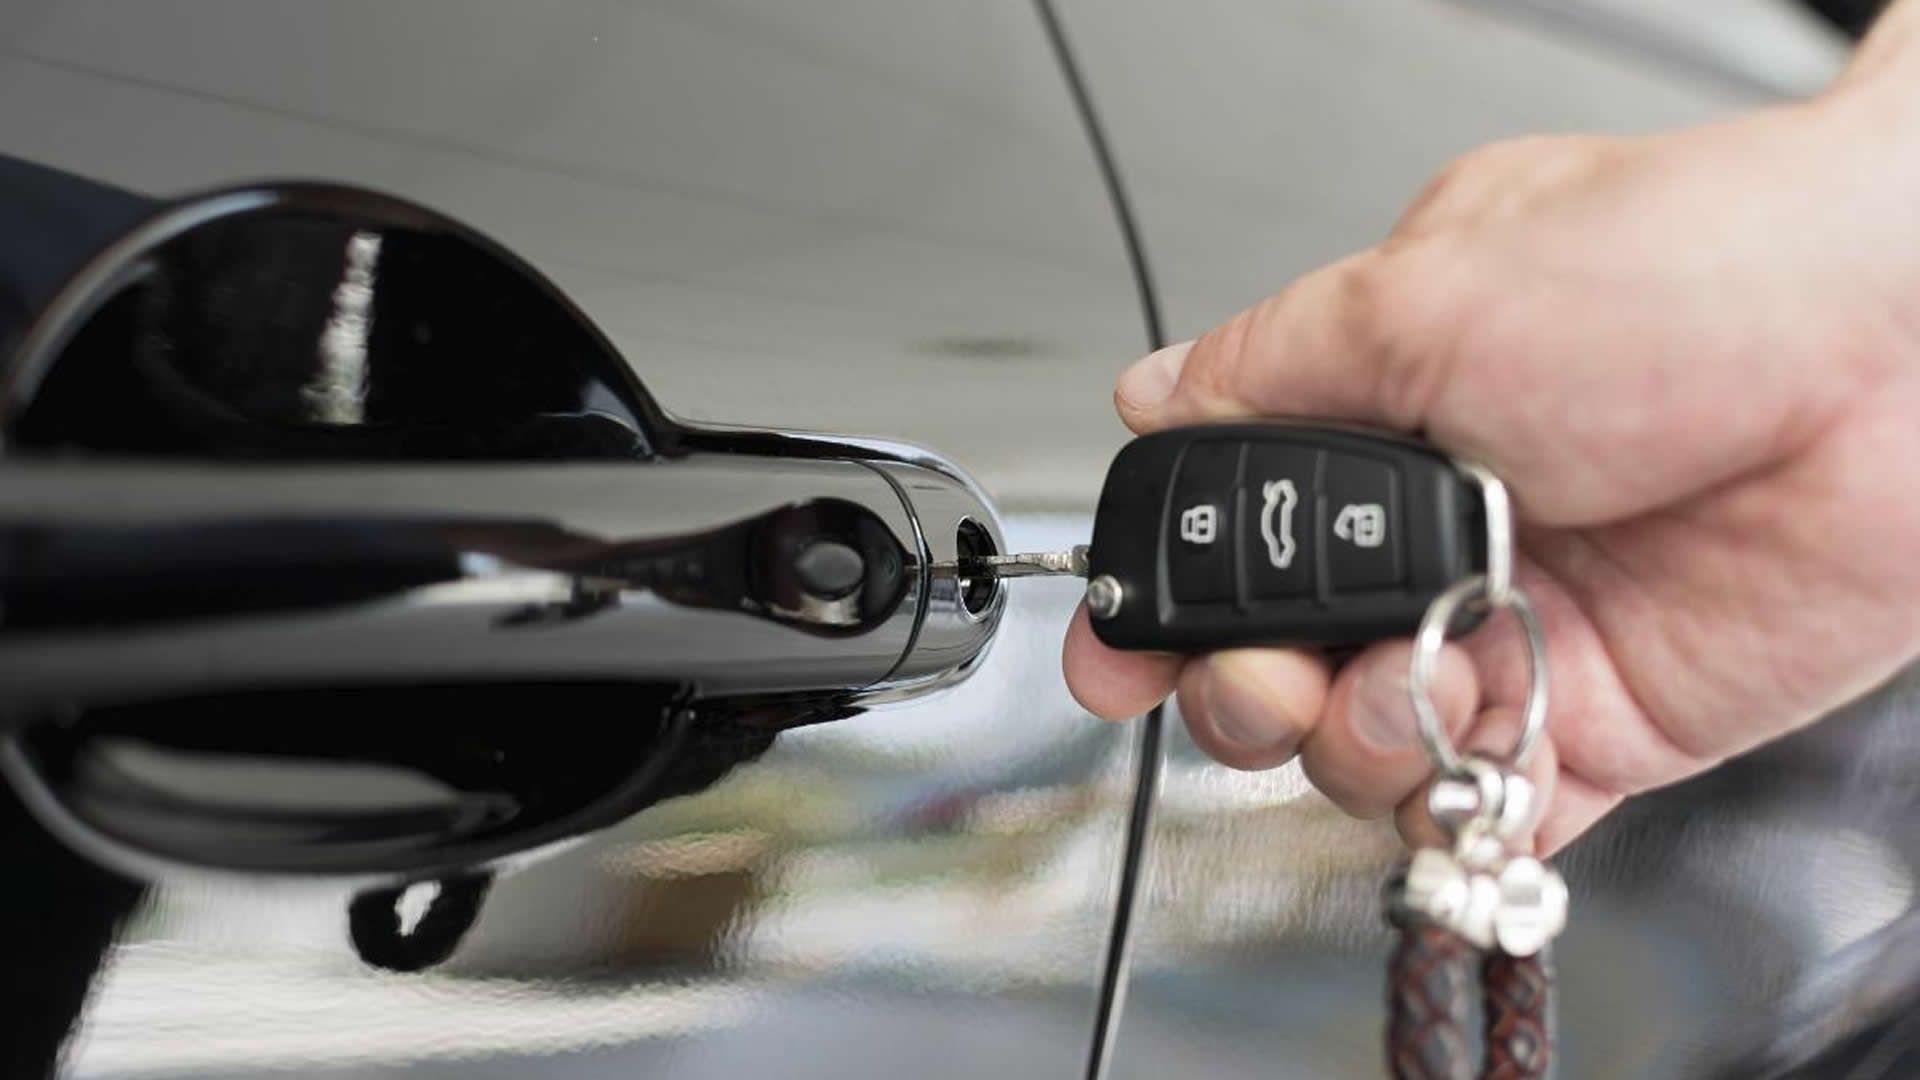 Car key Replacement Service Orlando Auto locksmith